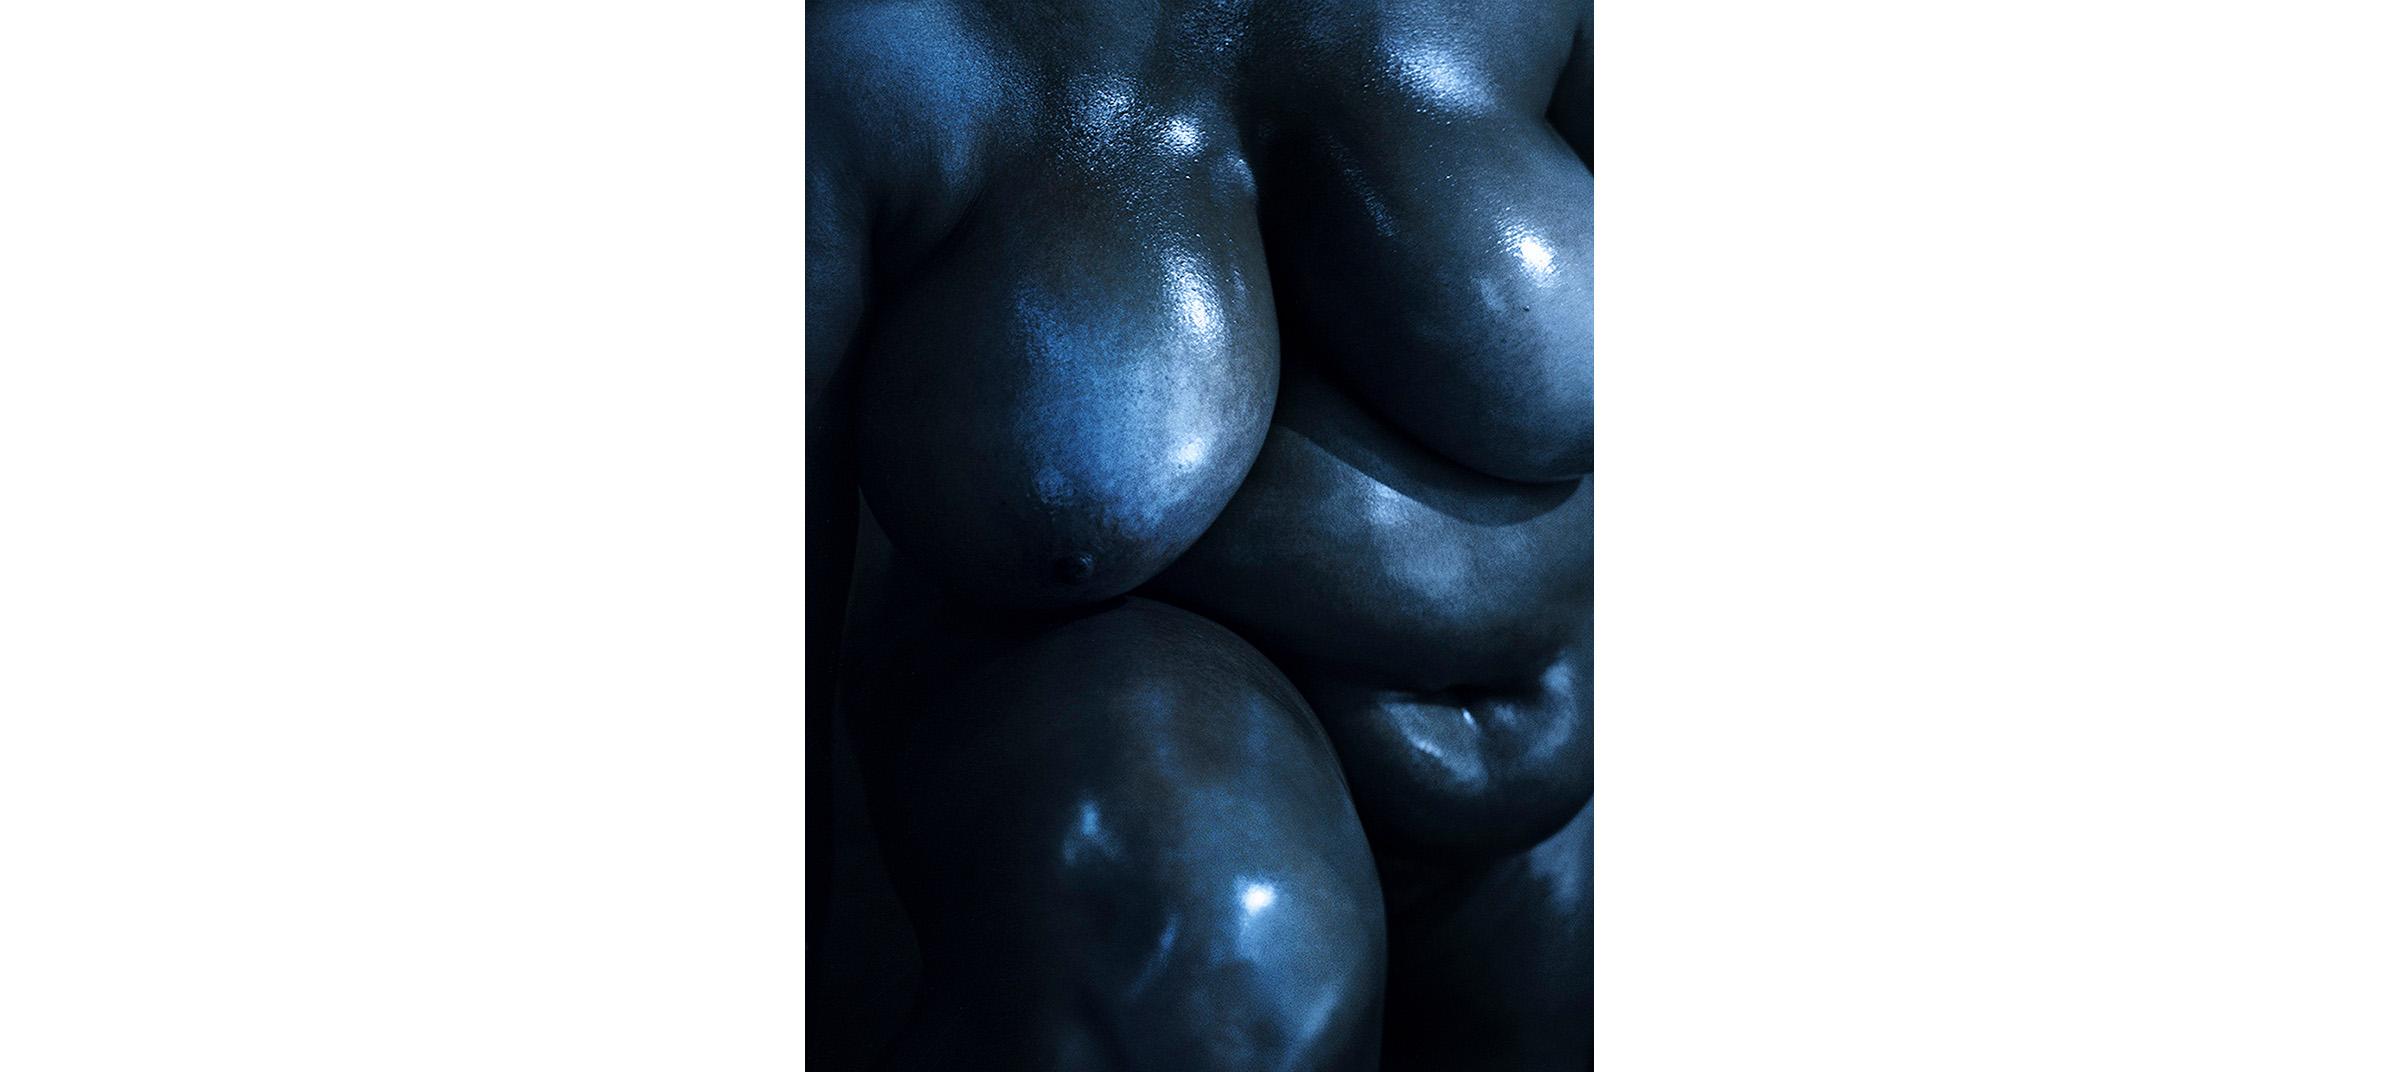 Blue Nudes  Untitled N°3, 2005 Tirage gélatino argentique, 144 x 104 cm | Gelatin silver print 56,59 x 40,94 inches  5/5